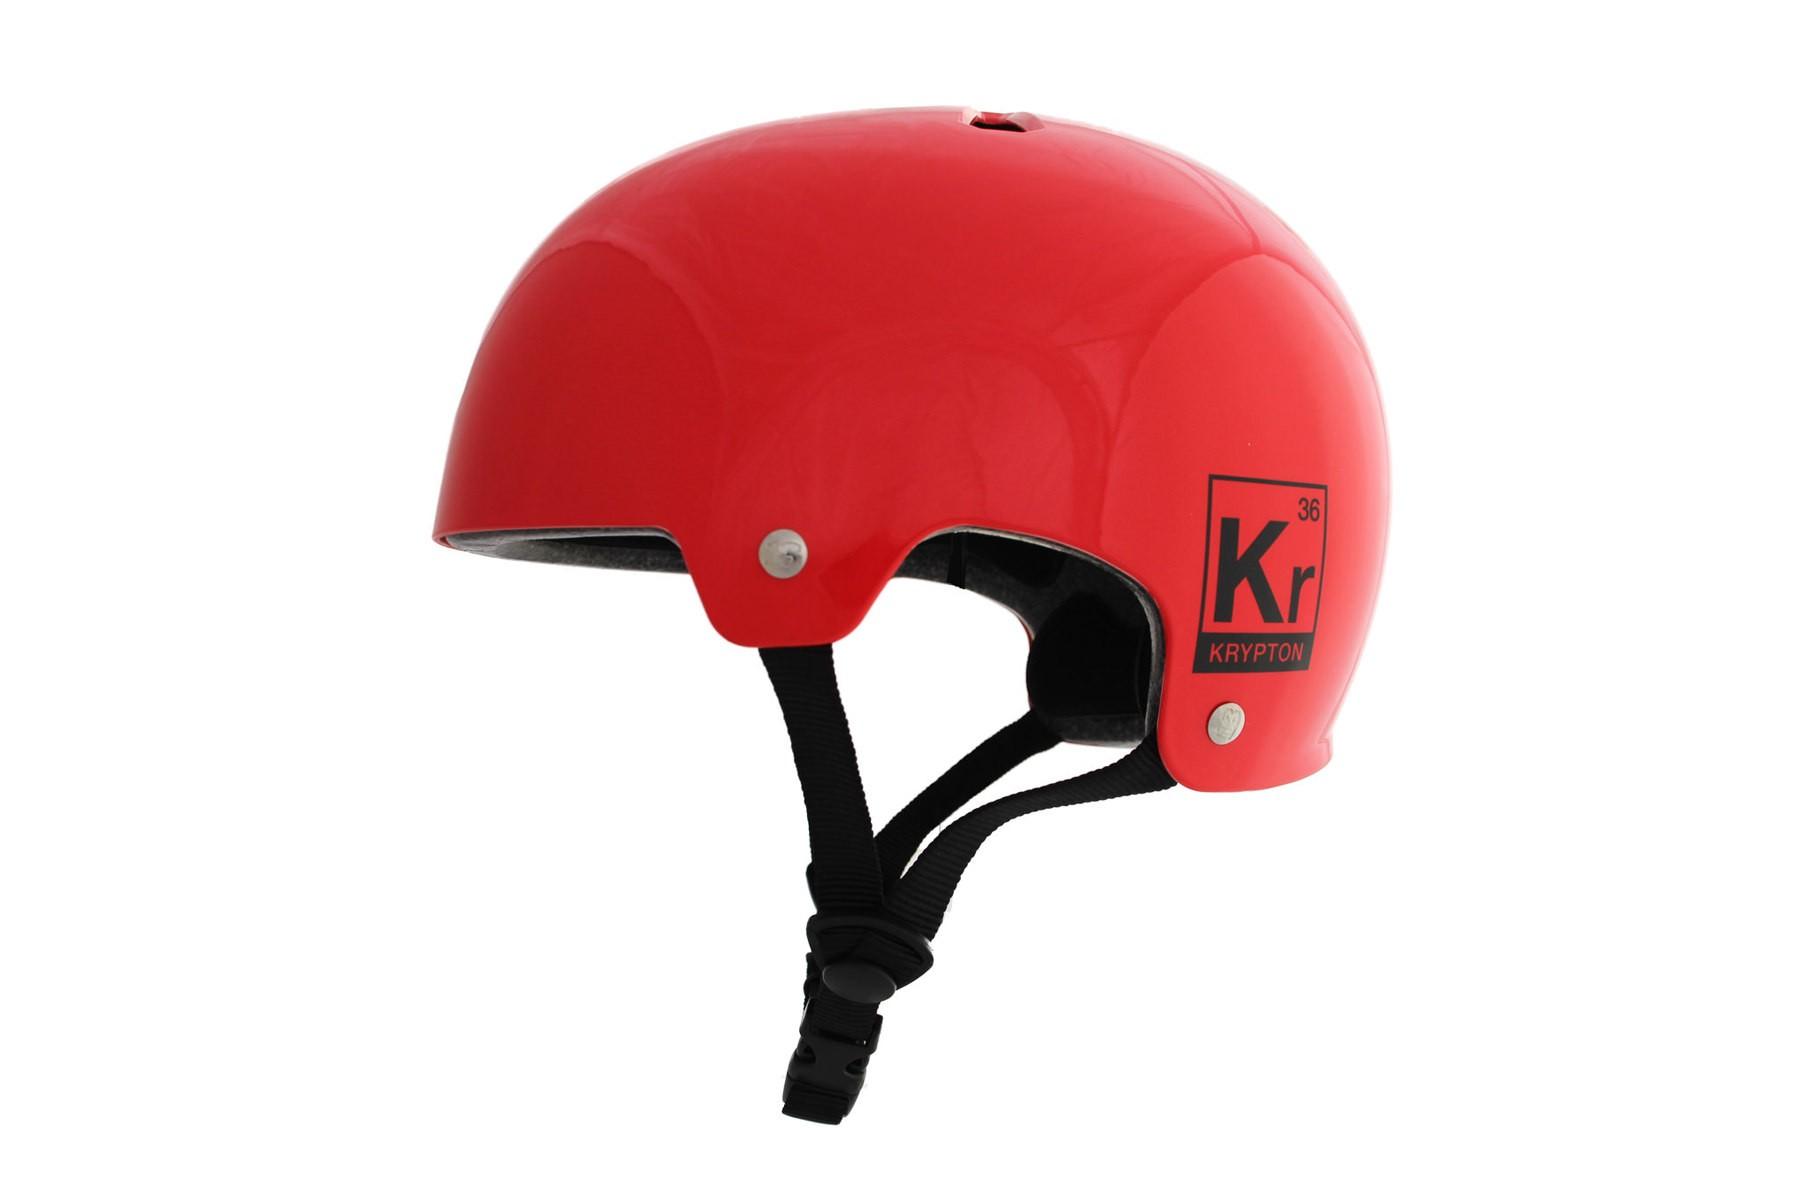 ALK13 Helmet Krypton Red Glossy